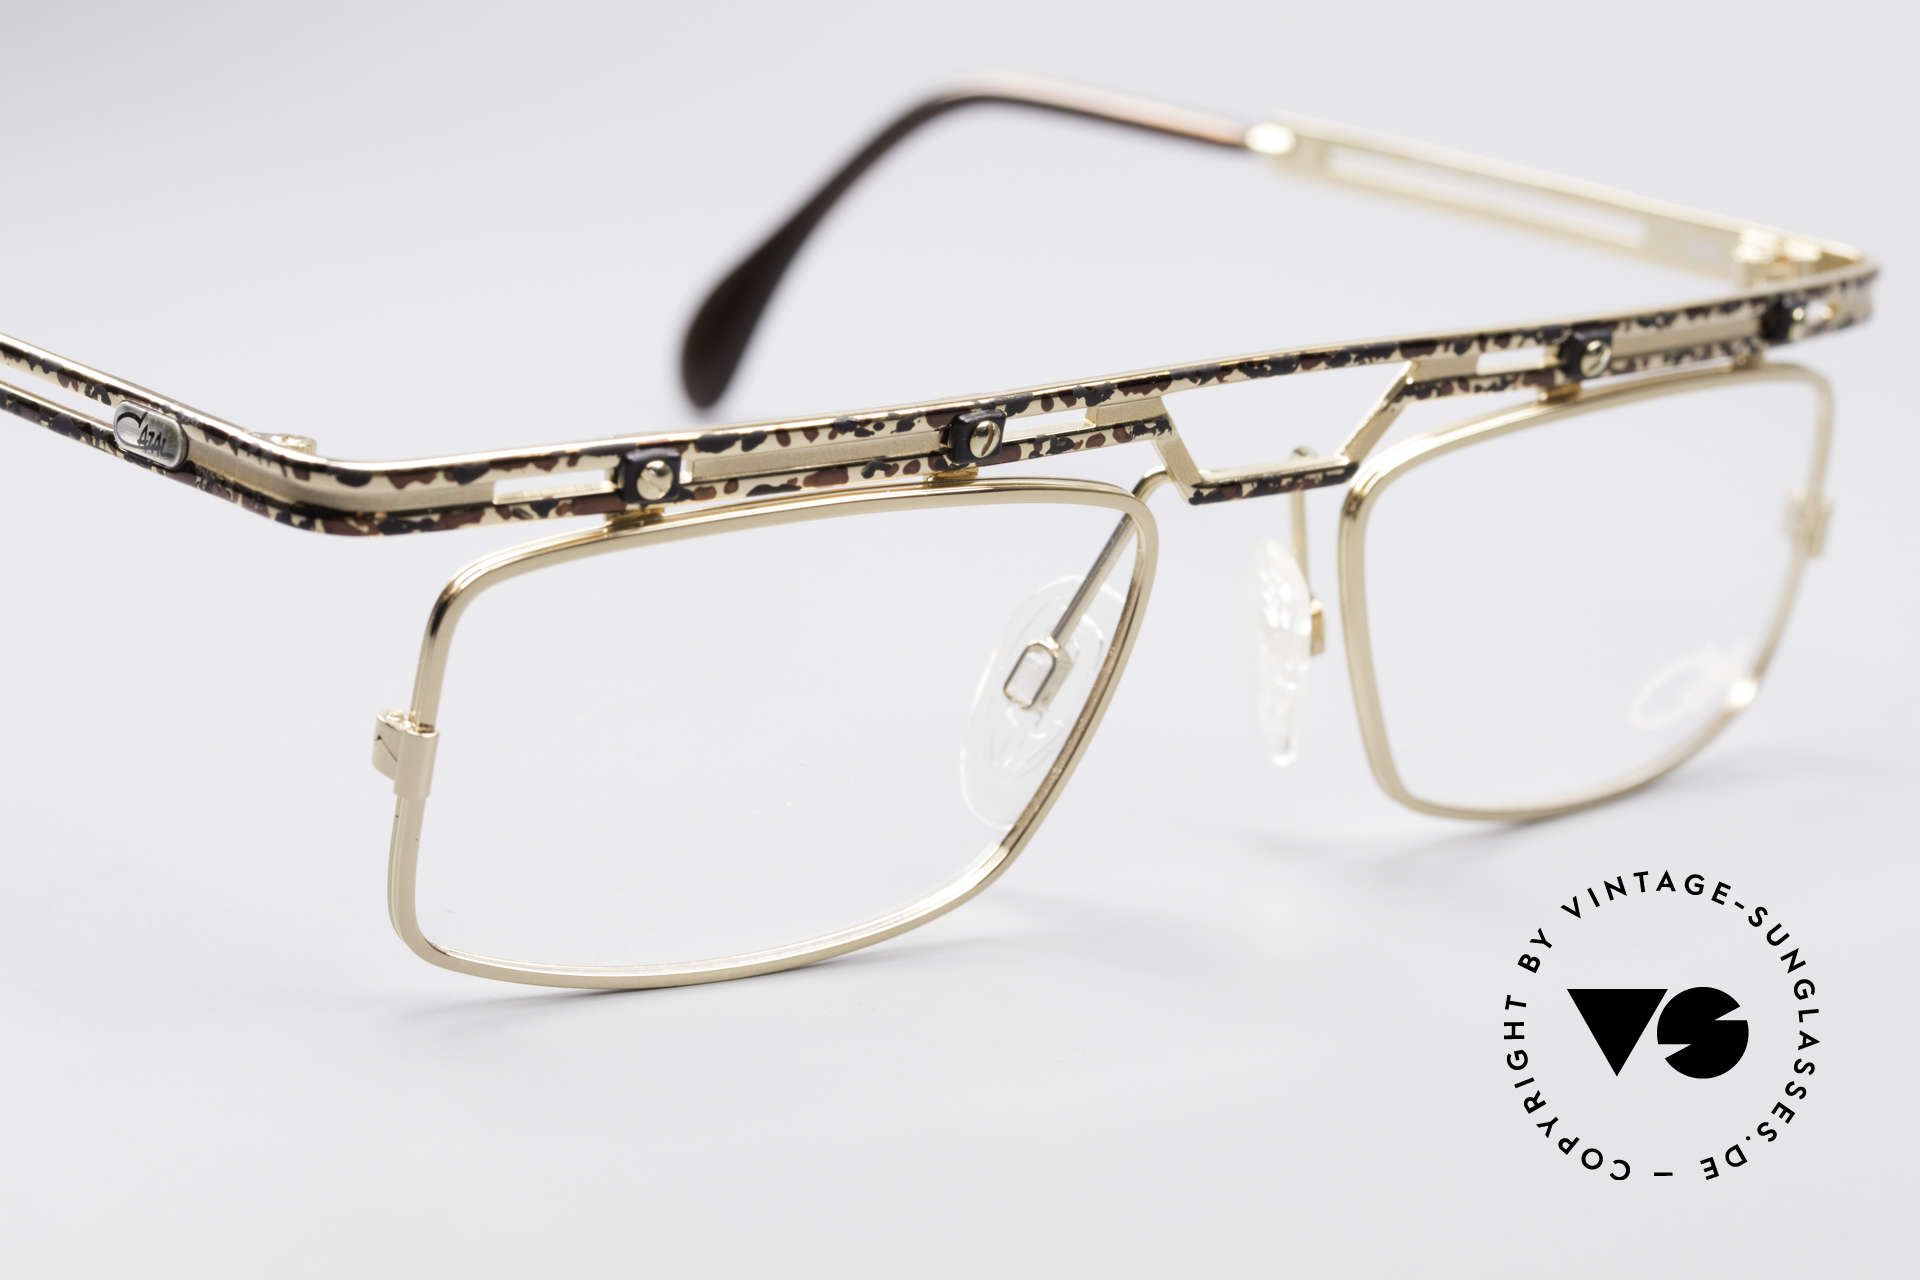 Cazal 975 True Vintage No Retro Glasses, never used (like all our rare vintage CAZAL eyewear), Made for Men